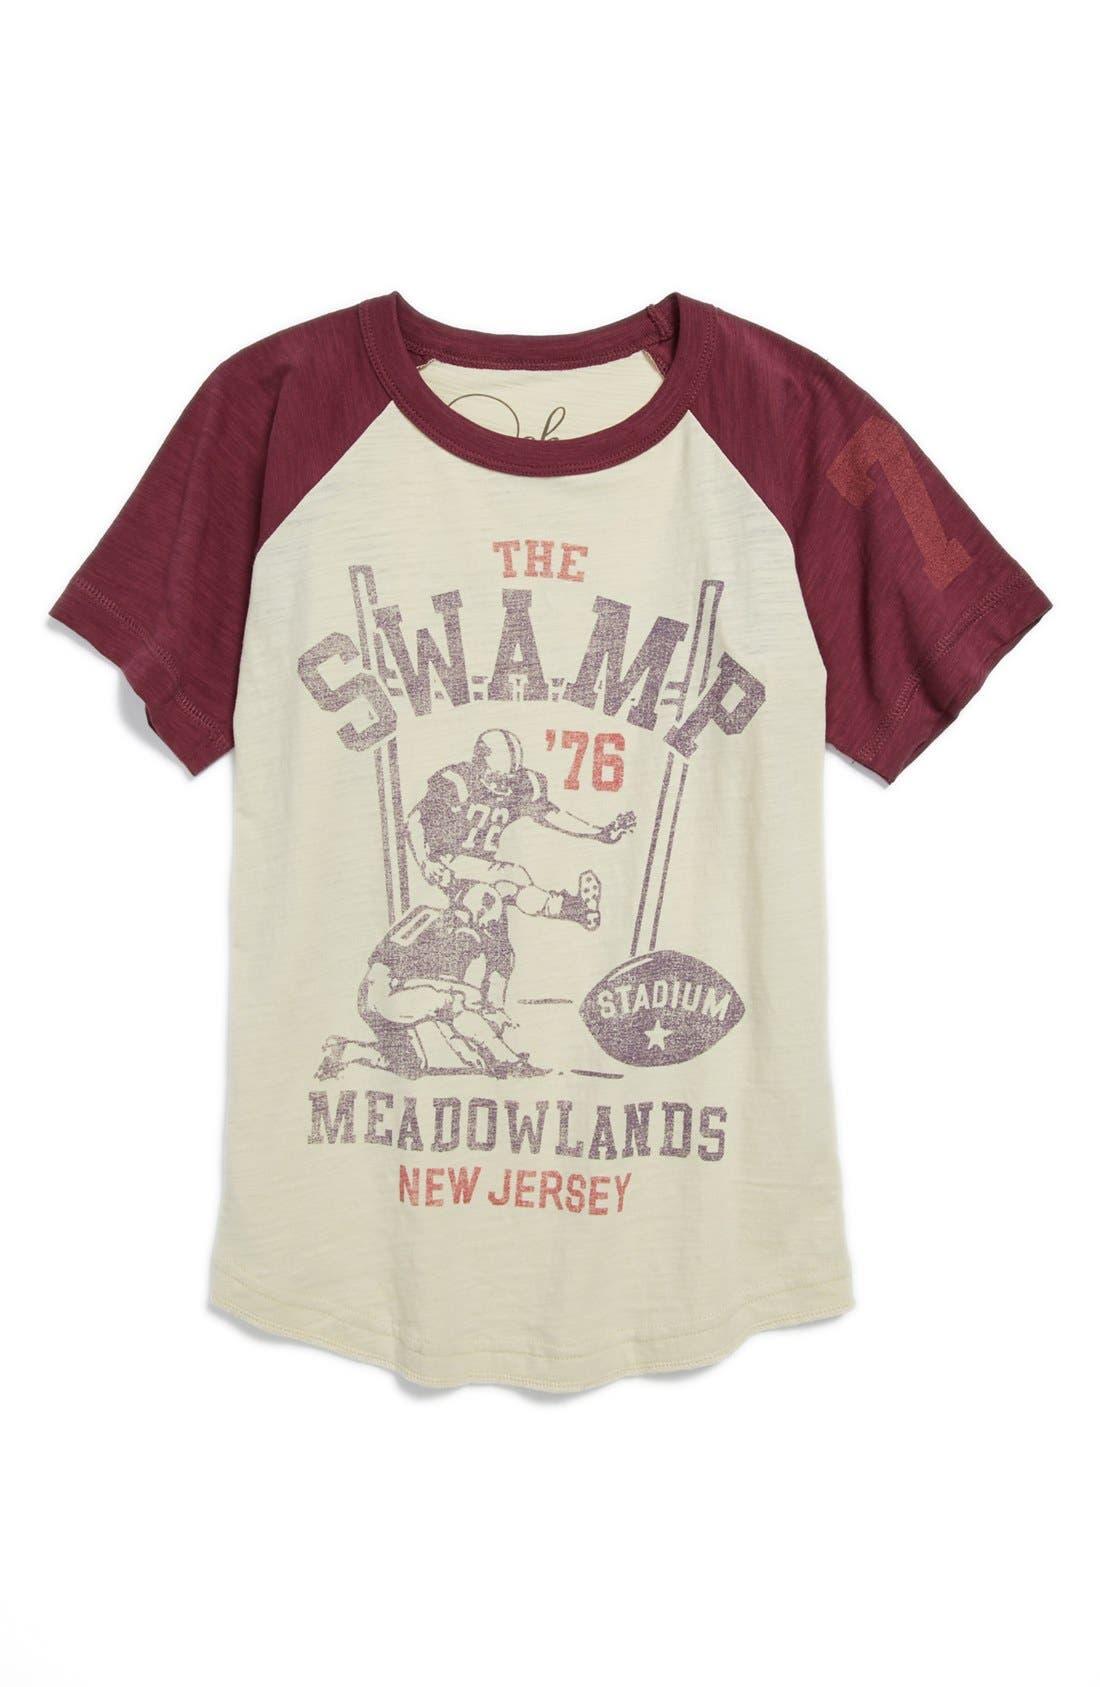 Alternate Image 1 Selected - Peek 'The Swamp' T-Shirt (Toddler Boys, Little Boys & Big Boys)